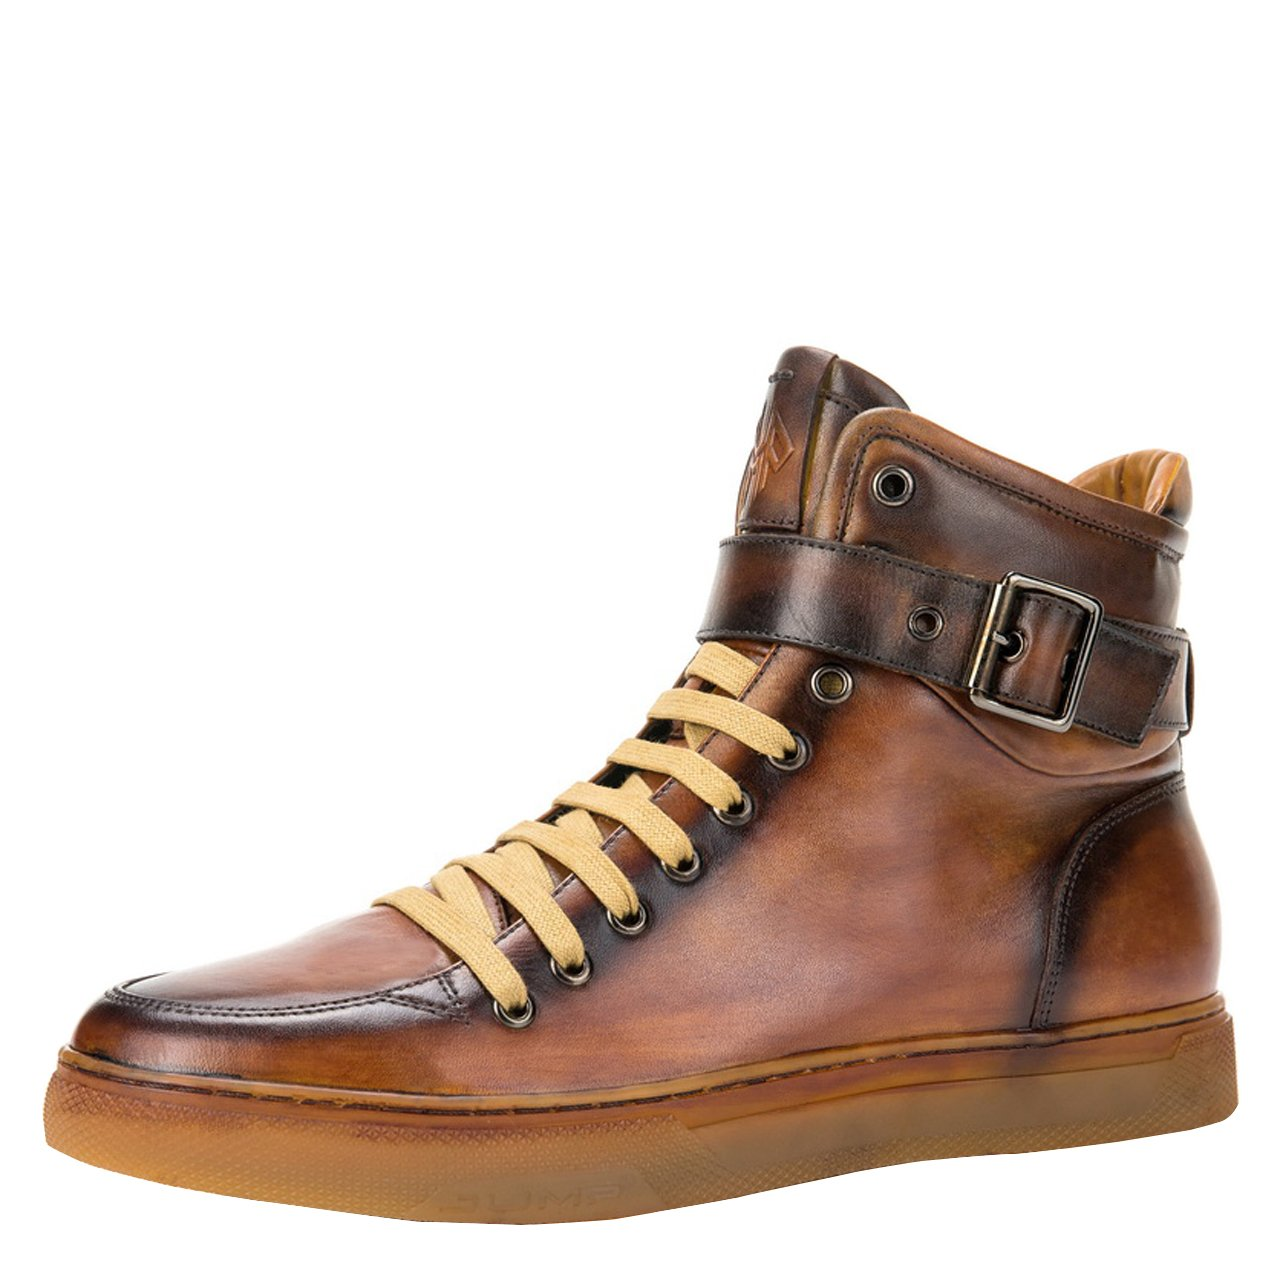 JUMP NEWYORK Men's Sullivan High-Top Fashion Sneaker Tan 8 D US